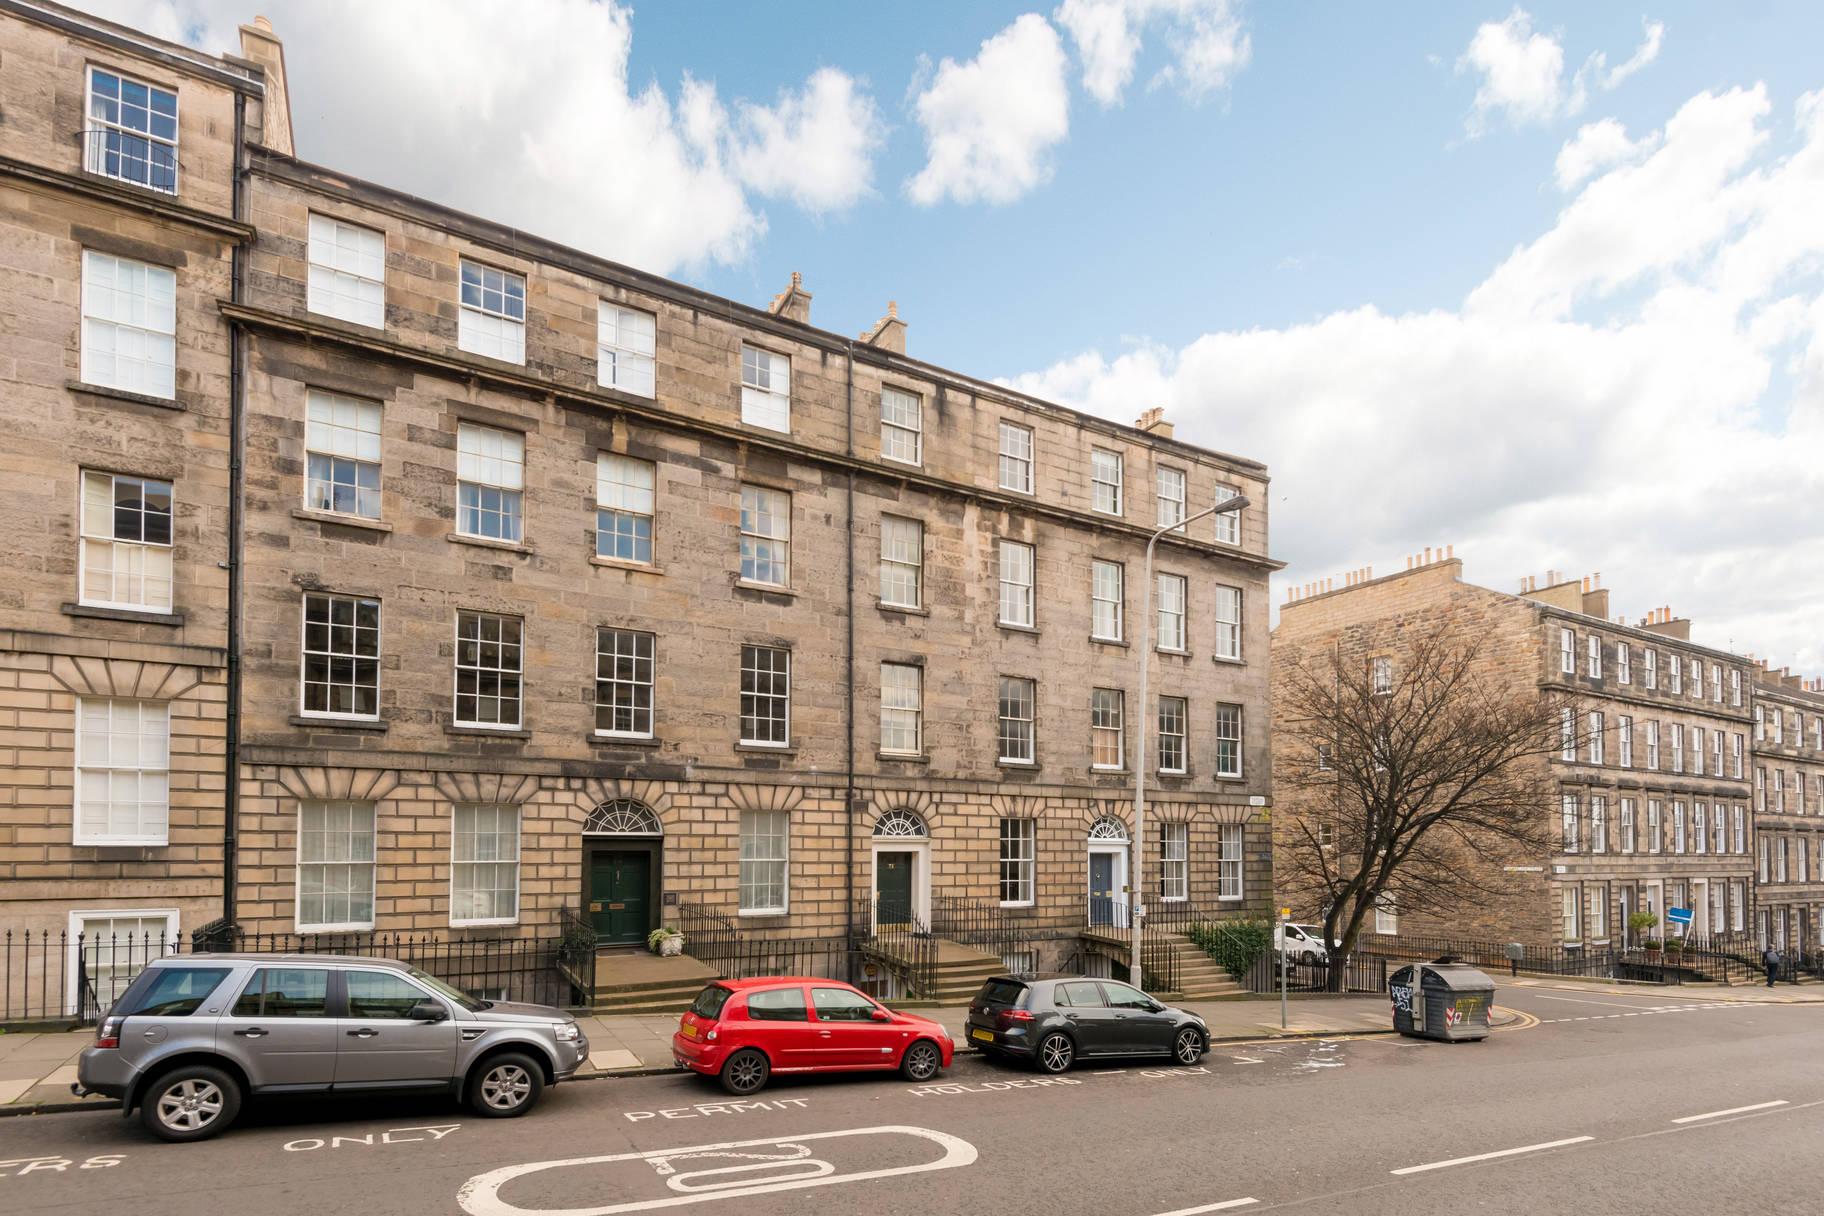 72/6 (3F2) Dundas Street, Edinburgh, EH3 6QZ